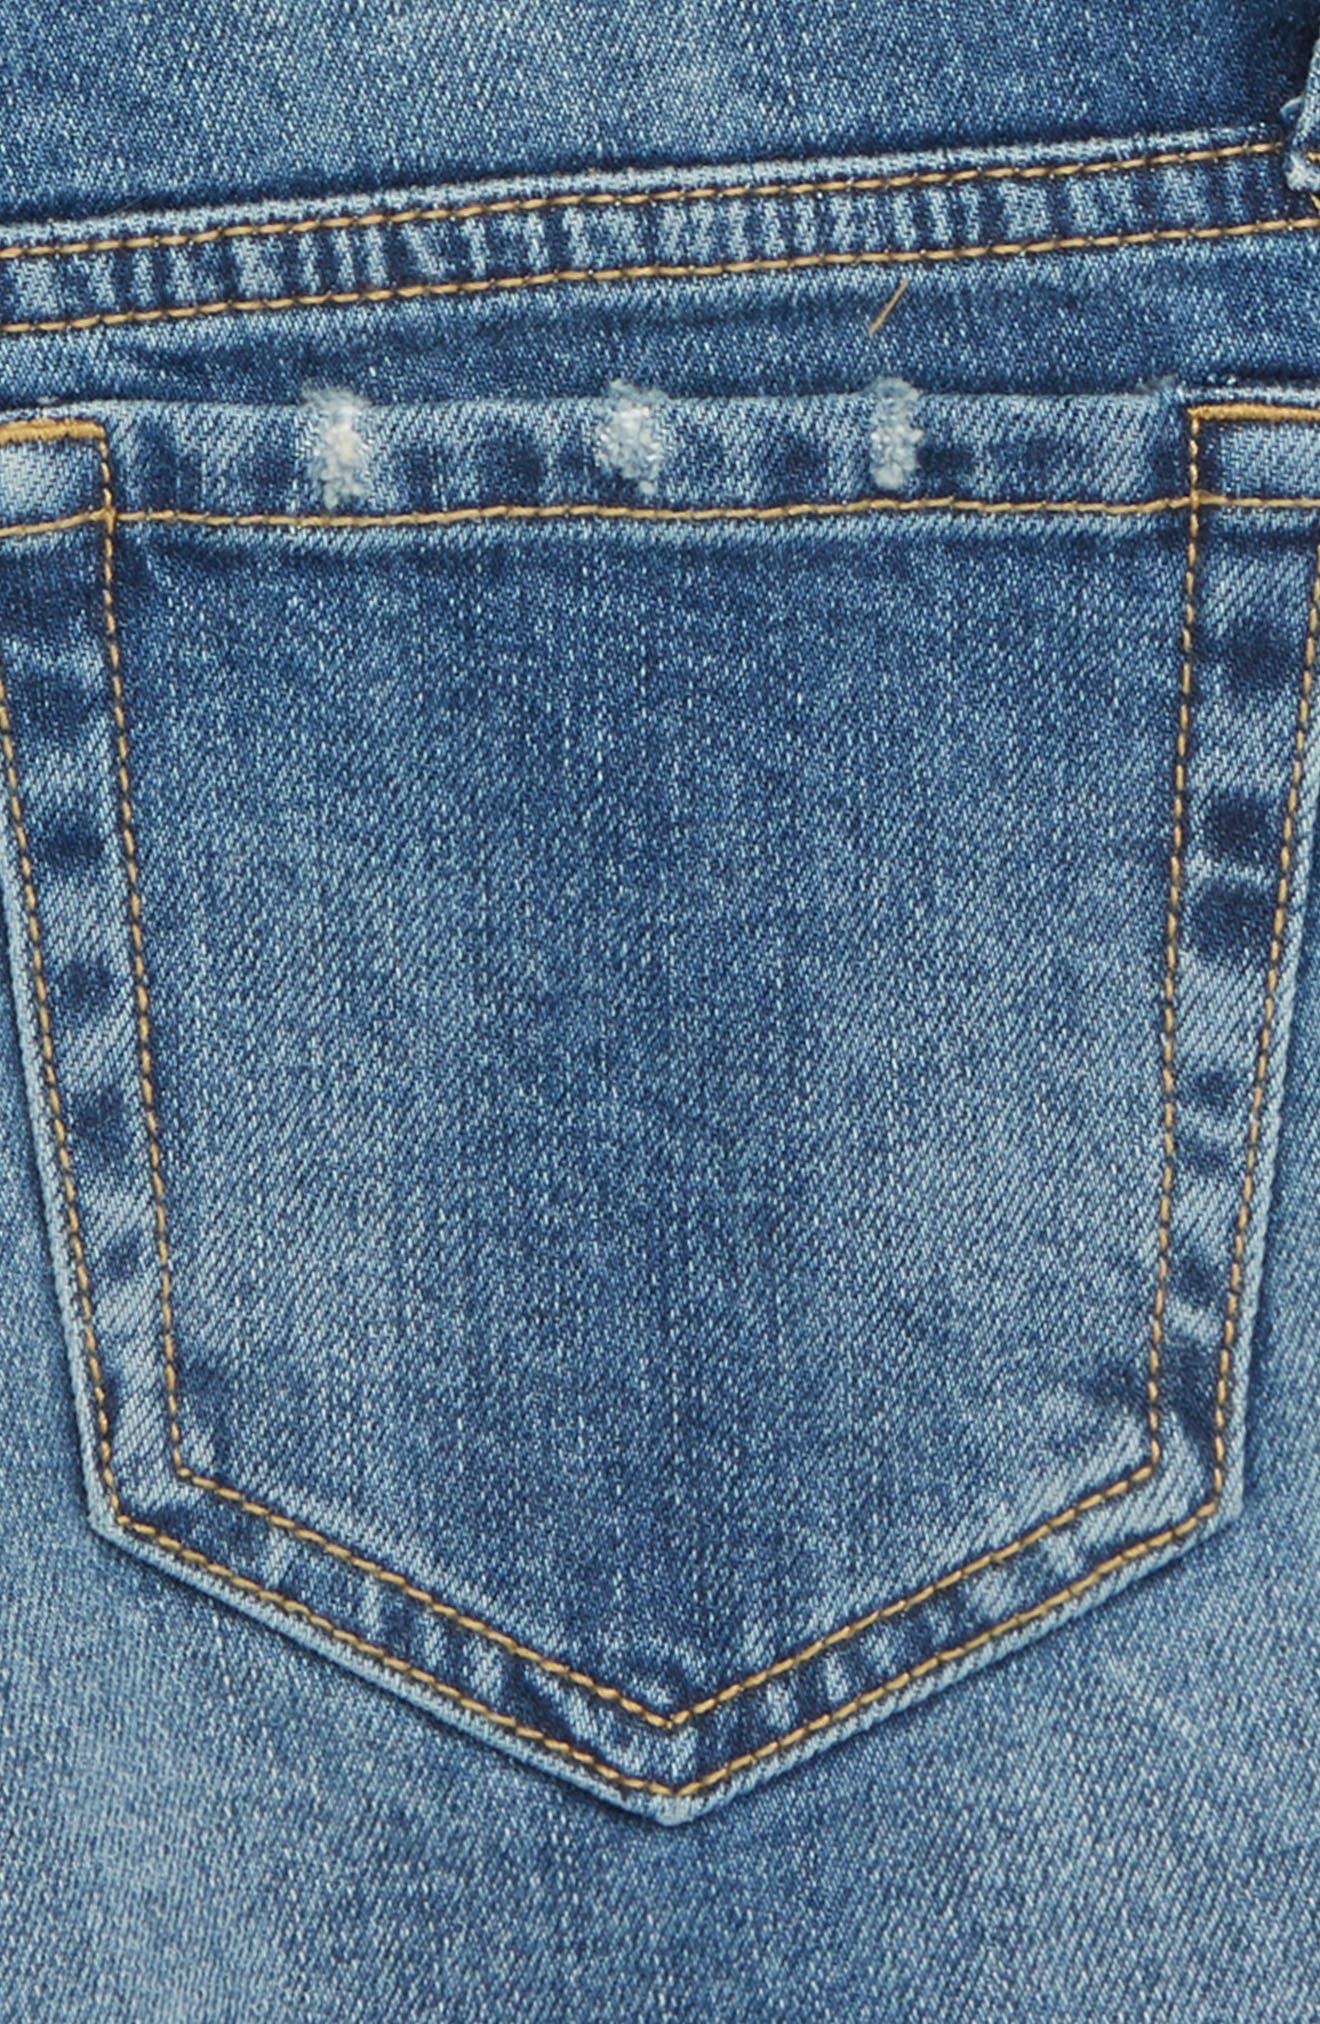 Festival Distressed Cutoff Denim Shorts,                             Alternate thumbnail 3, color,                             401